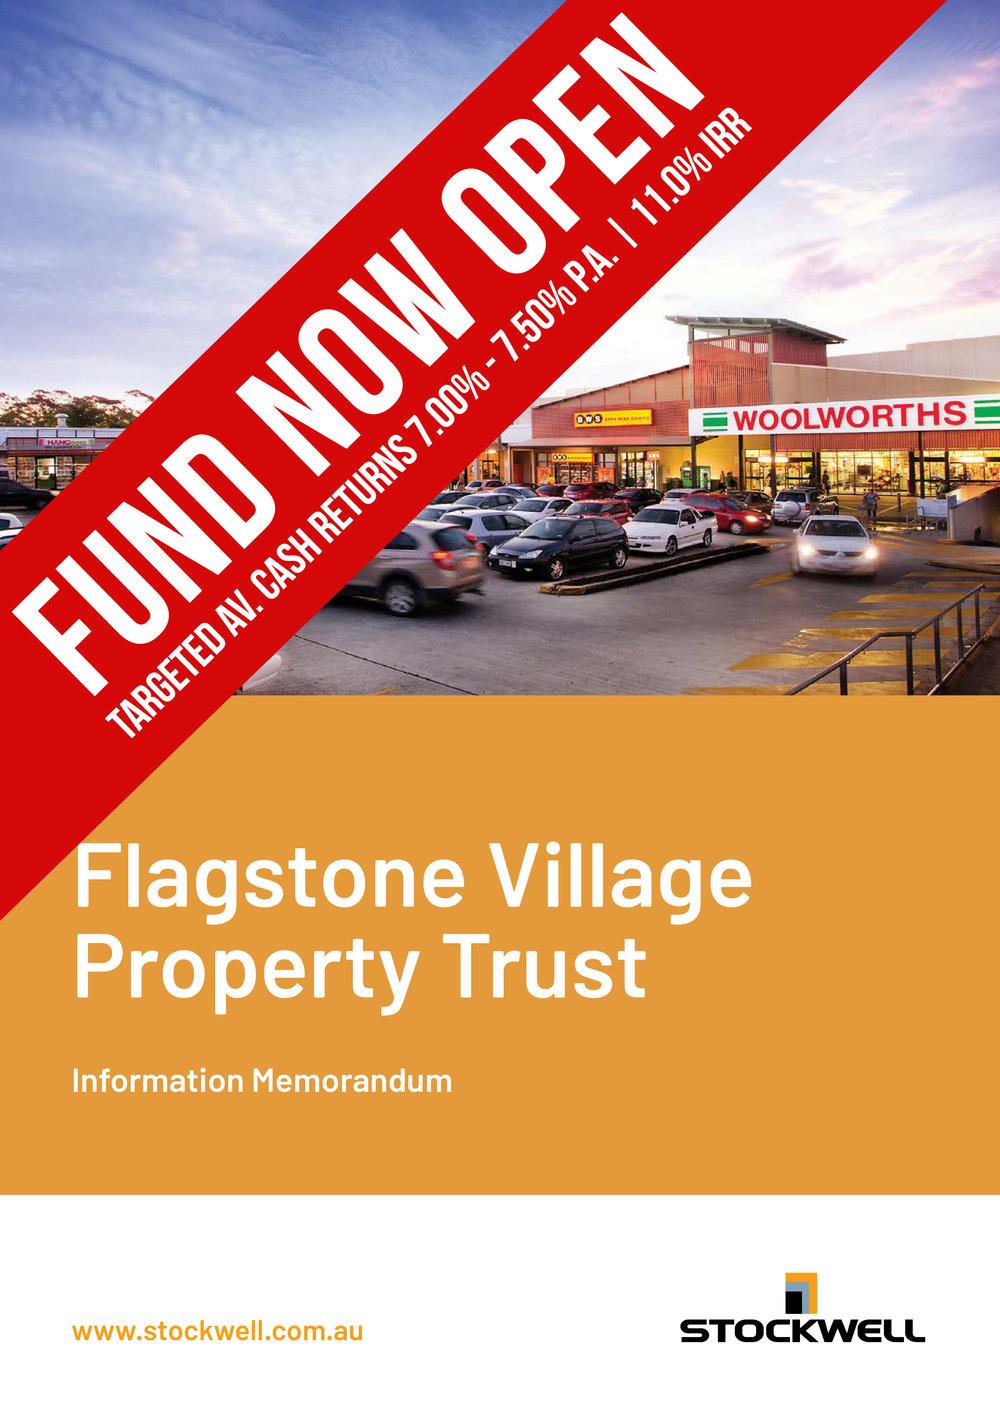 Flagstone village property trust